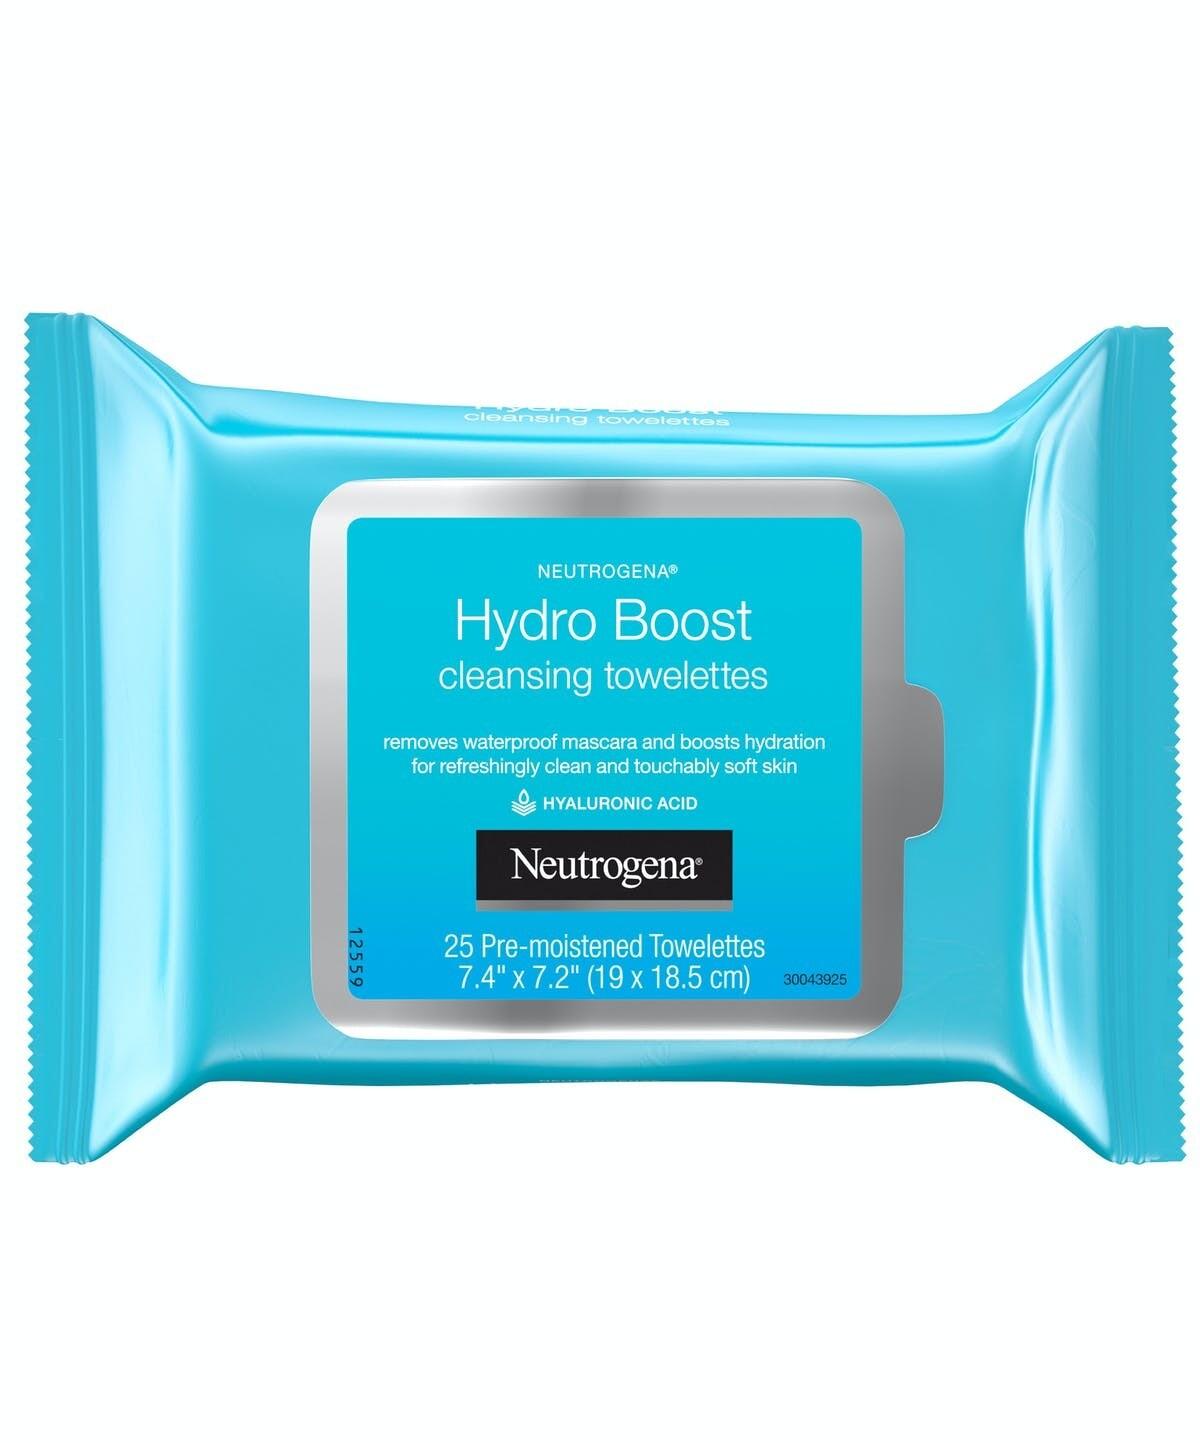 Hydro Boost Face Cleansing ሃይድሮ ቦስት ፌስ ክሊንሲንግ